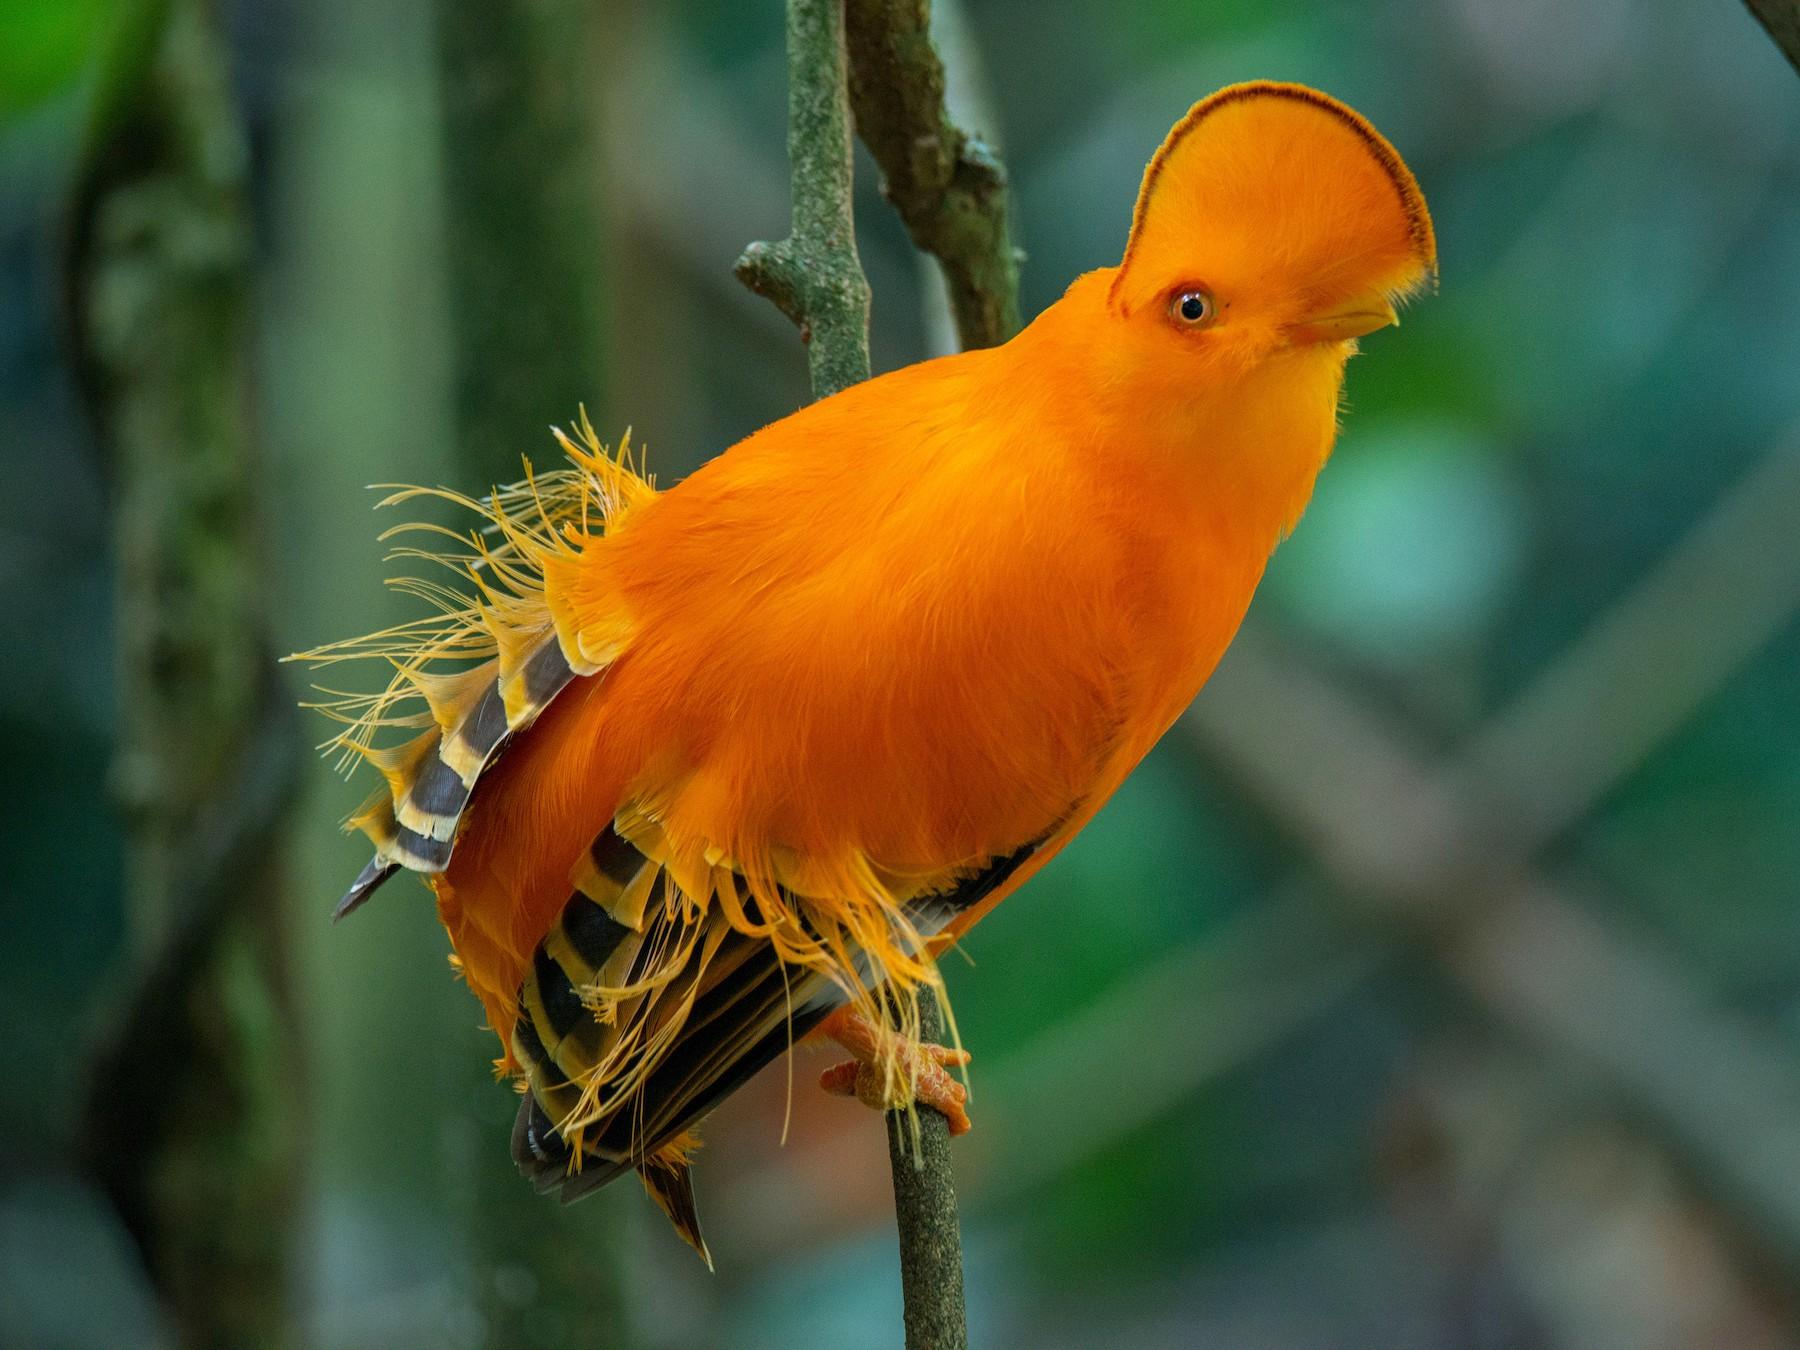 Guianan Cock-of-the-rock - John C. Mittermeier